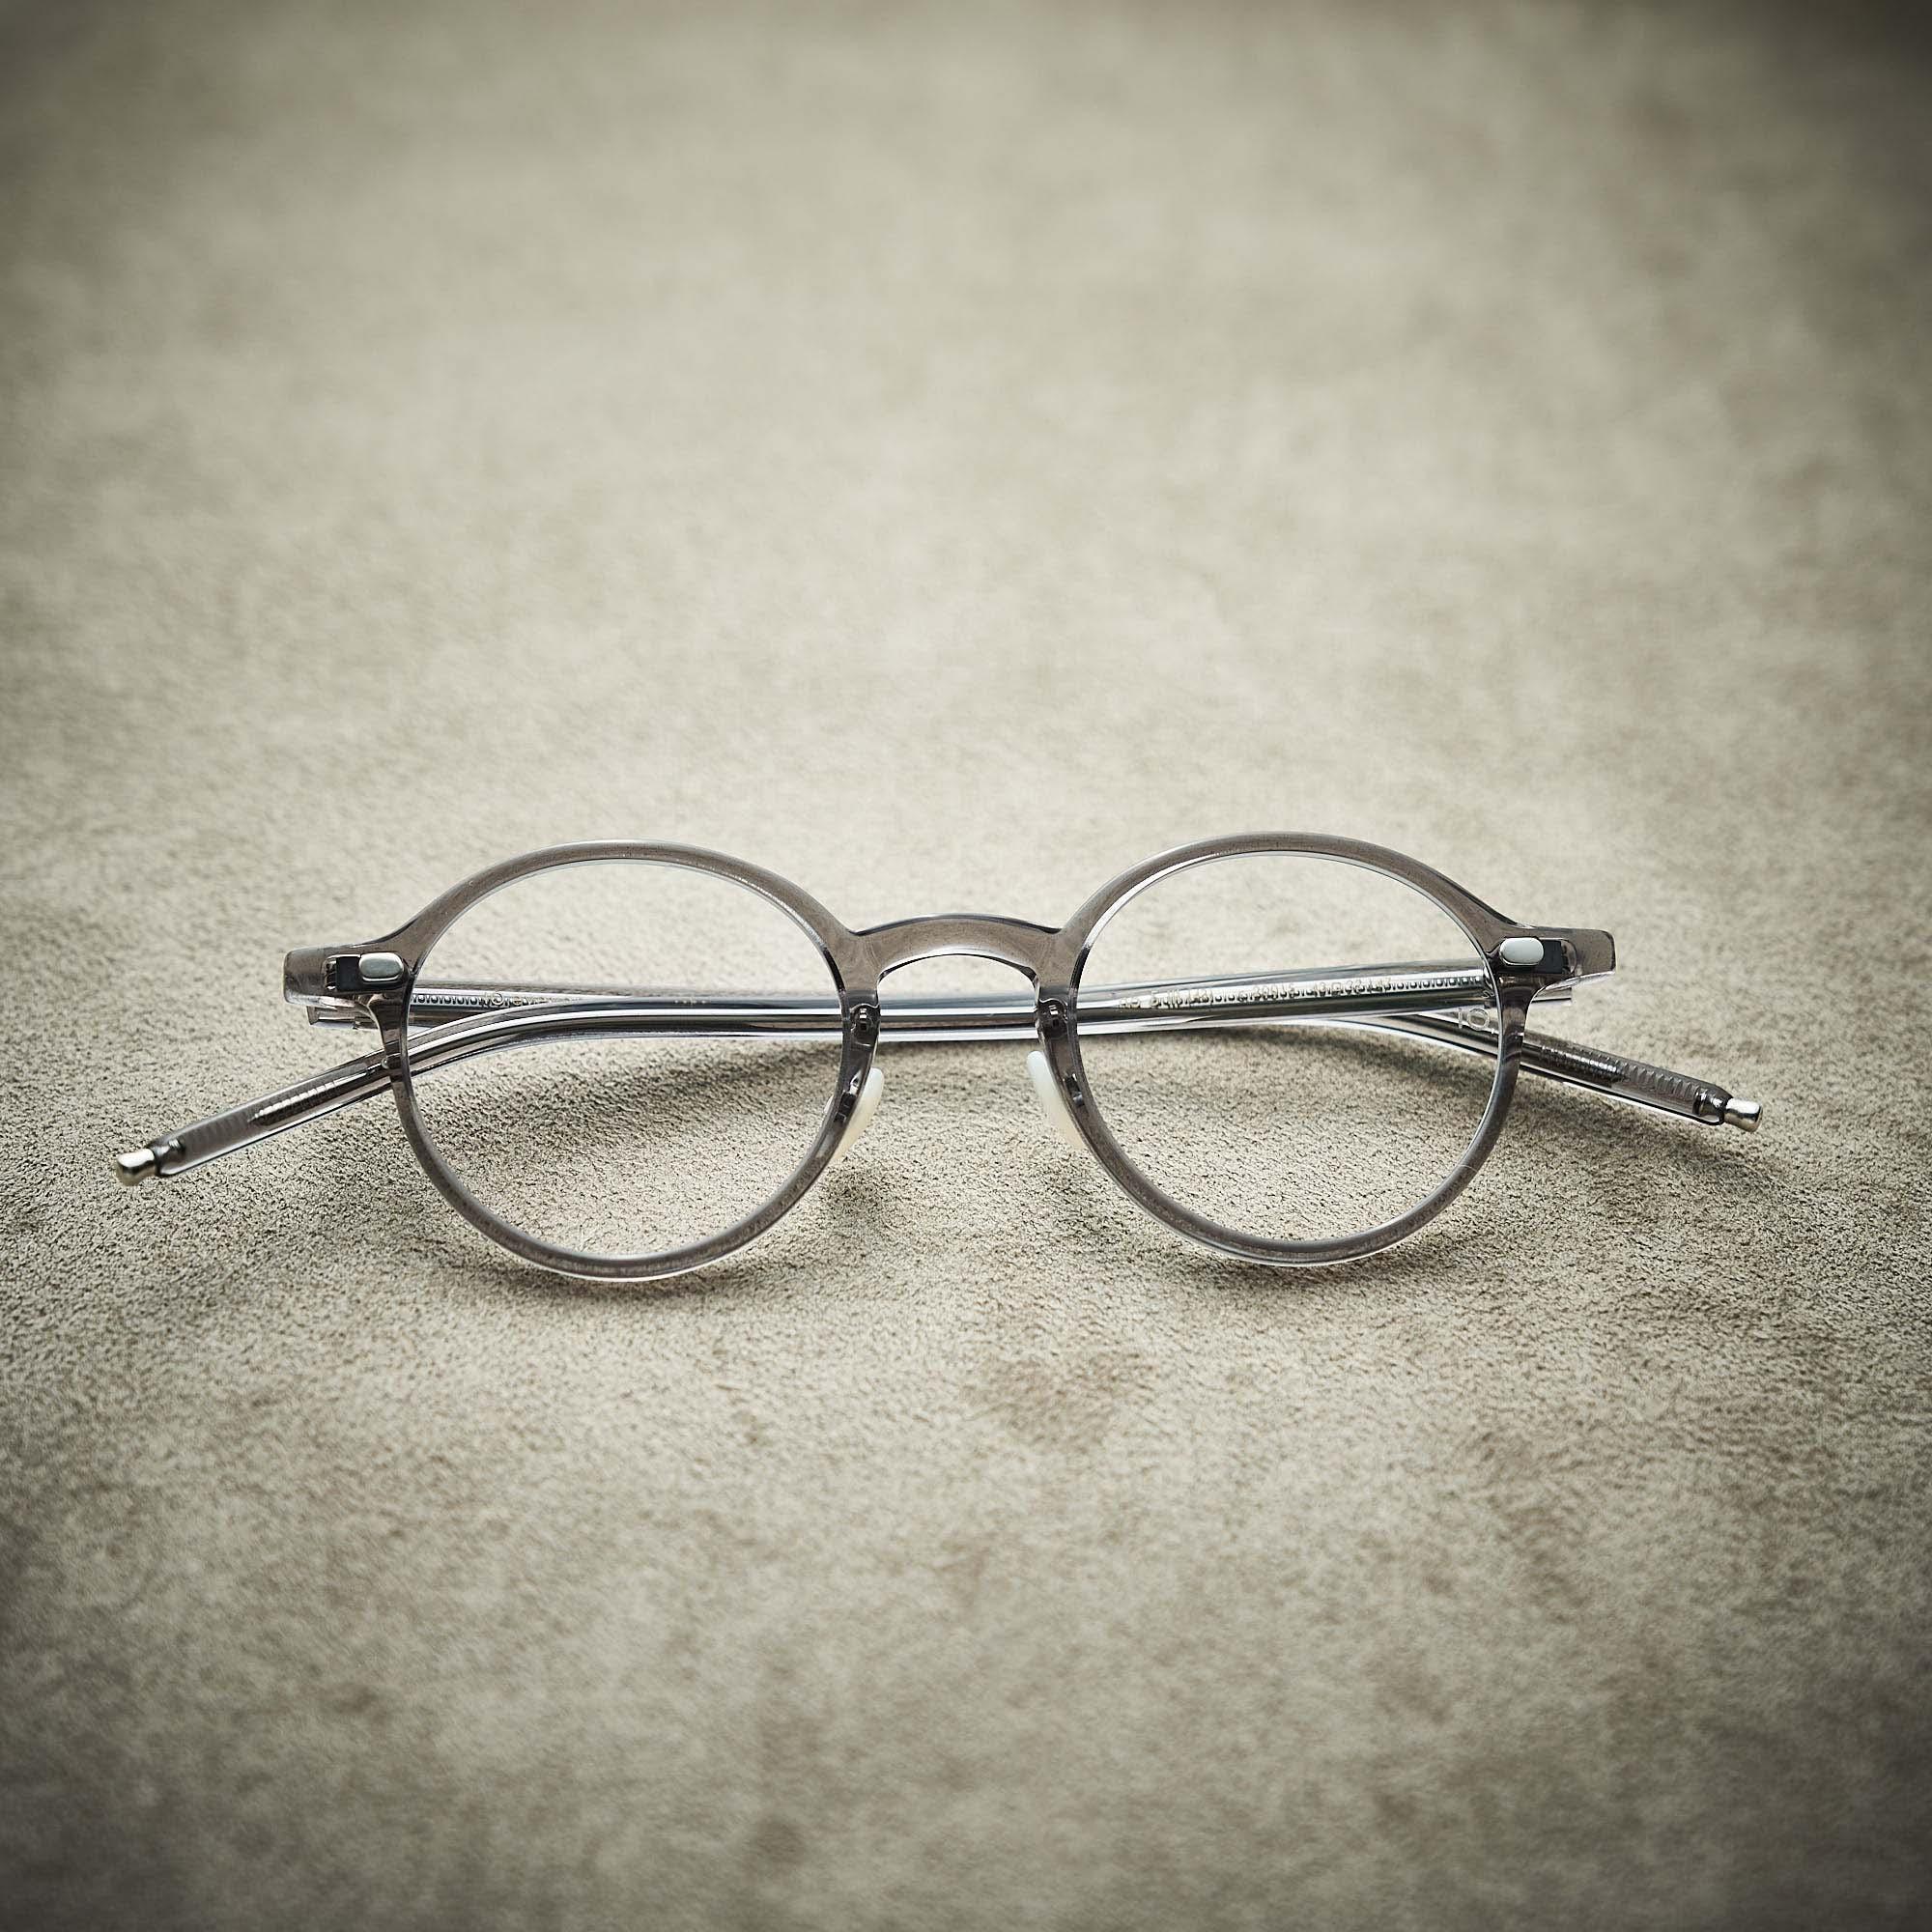 「10 eyevan セルロイドコレクション」直営店限定カラー発売